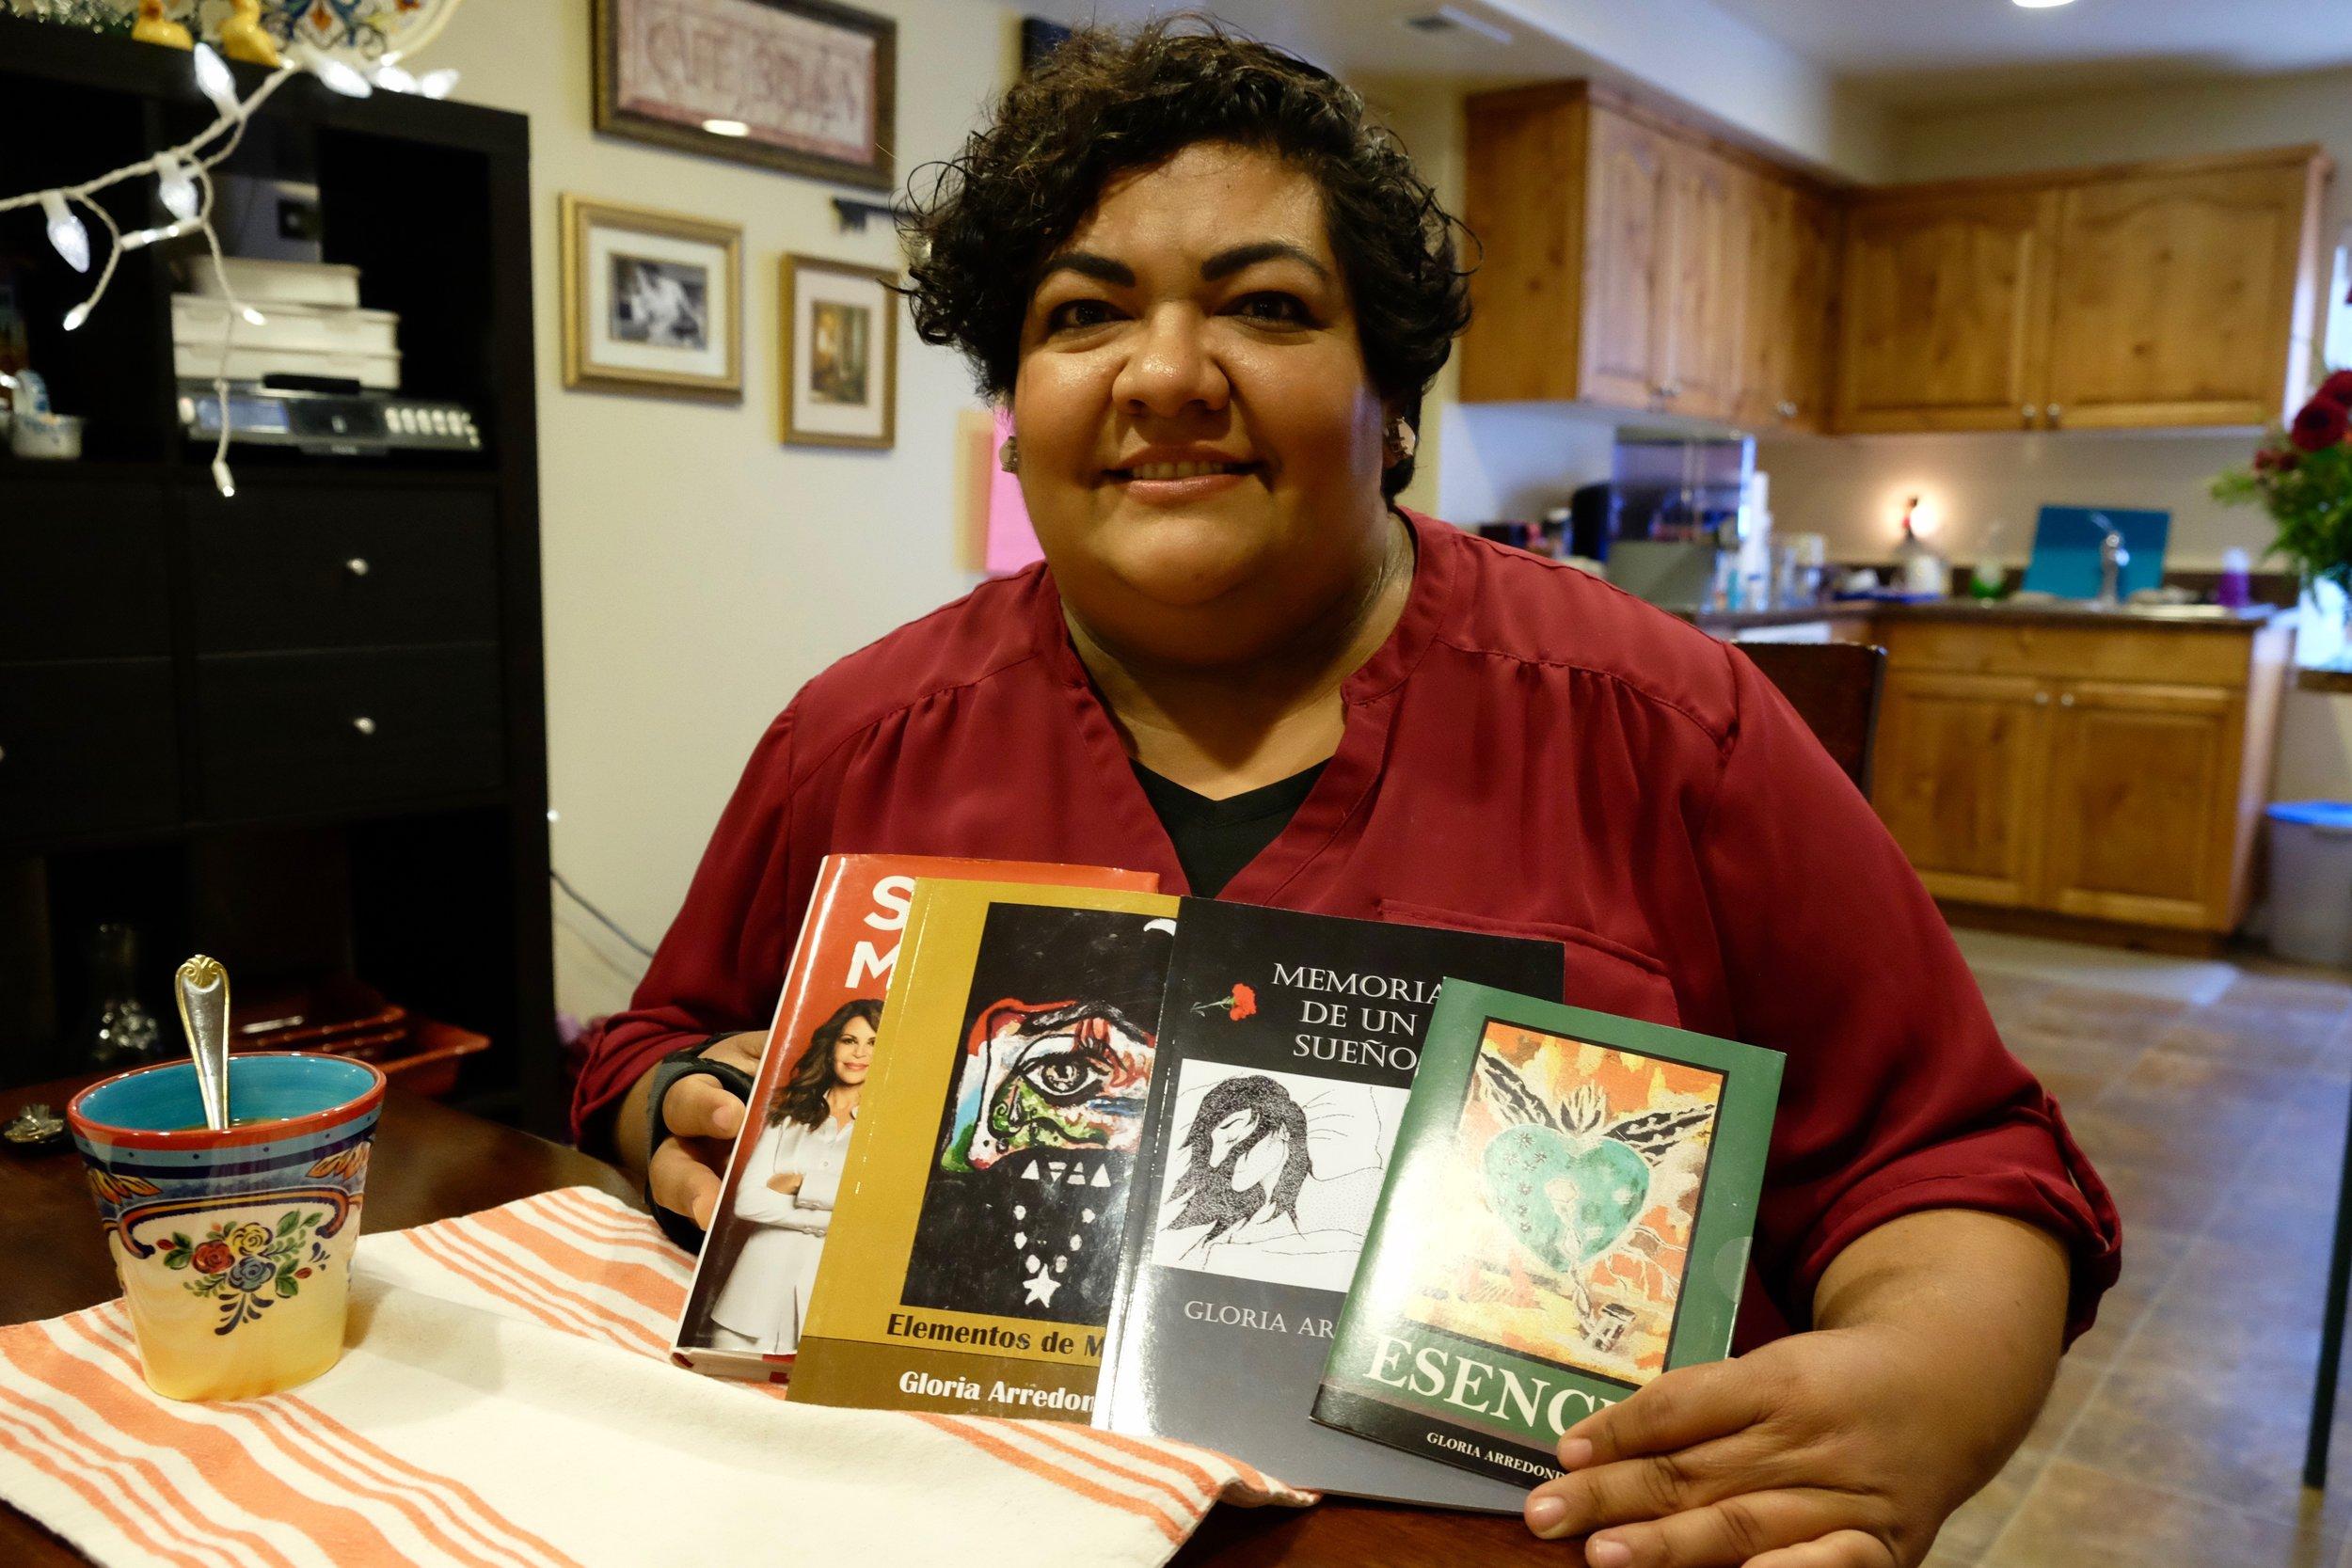 Writer Gloria Arredondo holds some of her published works. (Andrea Smardon)